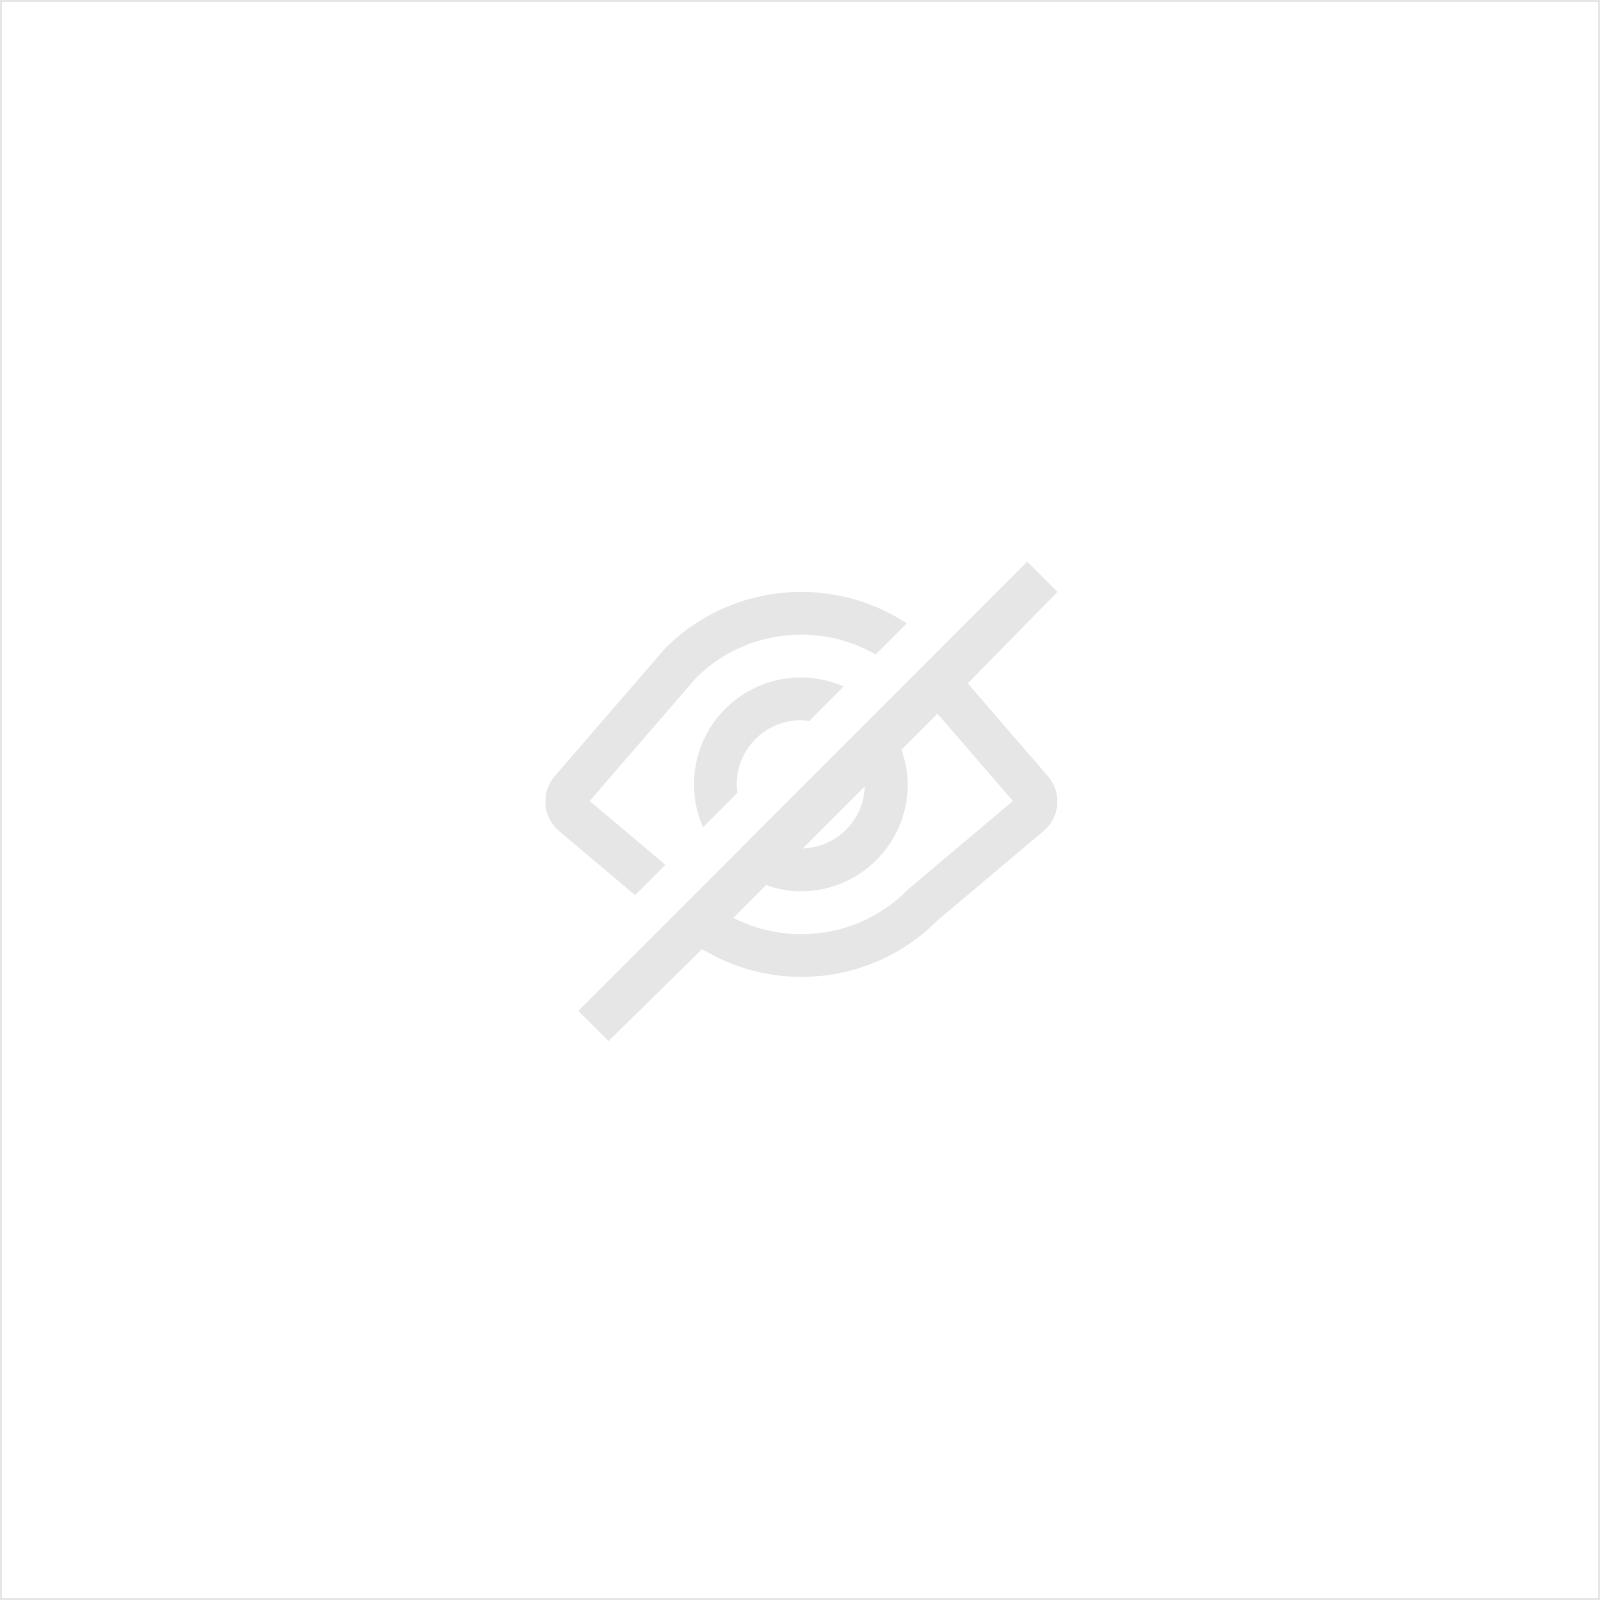 AUTOSOL AUTO SHAMPOO FLES 500 ML